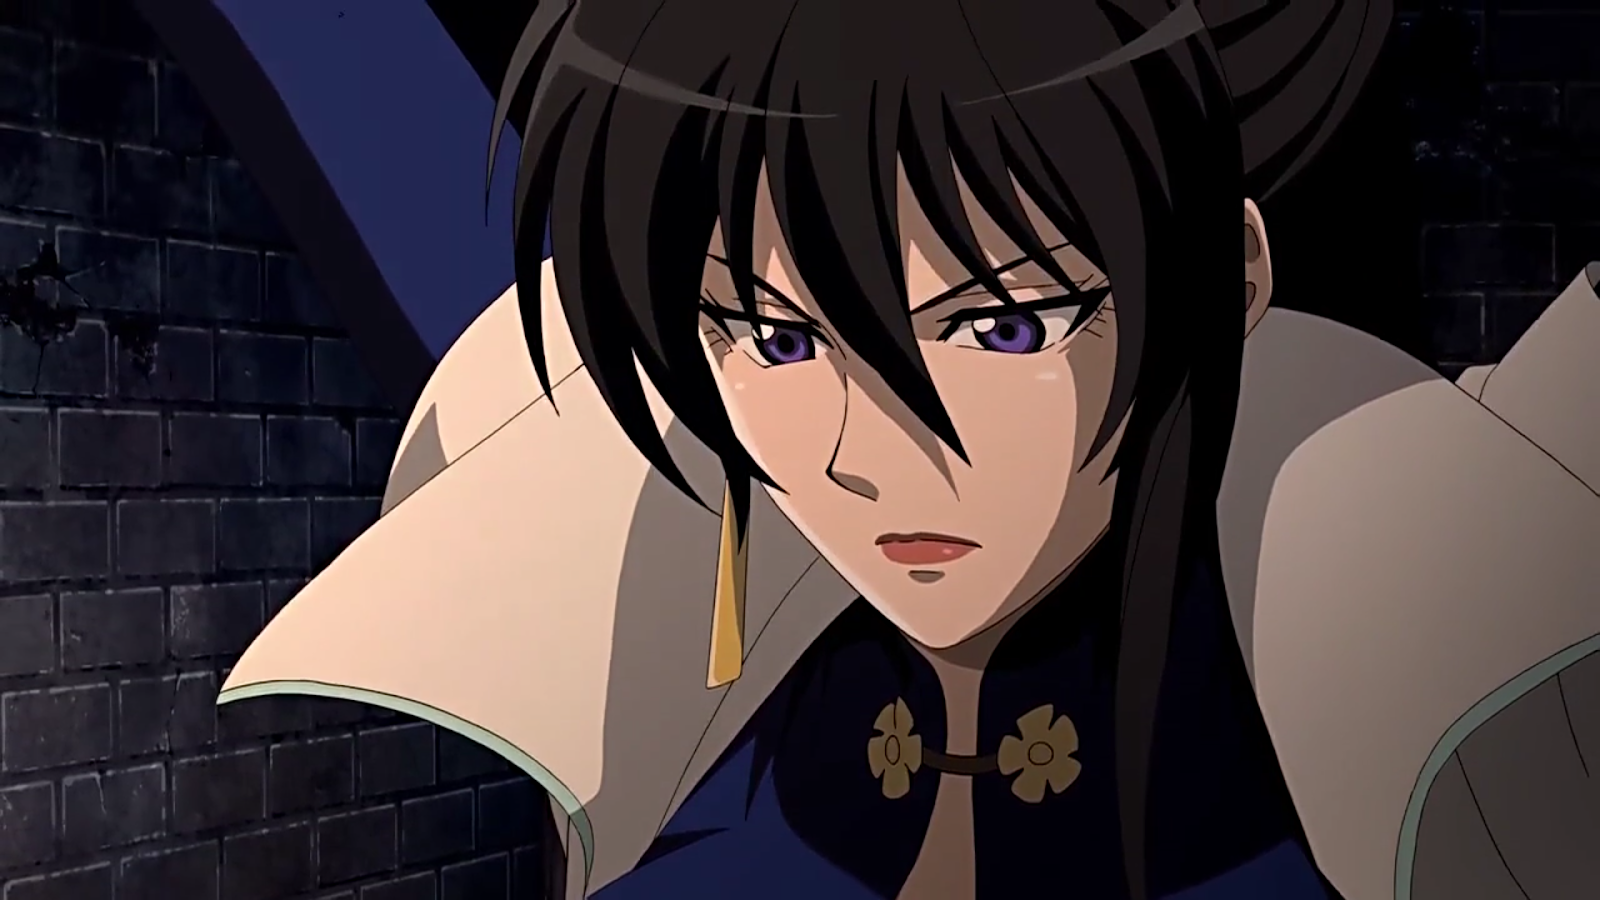 Online Download Anime Tong Ling Fei English Sub: Sword Dynasty [Jian Wangchao] Episode 3 Subtitle Indonesia